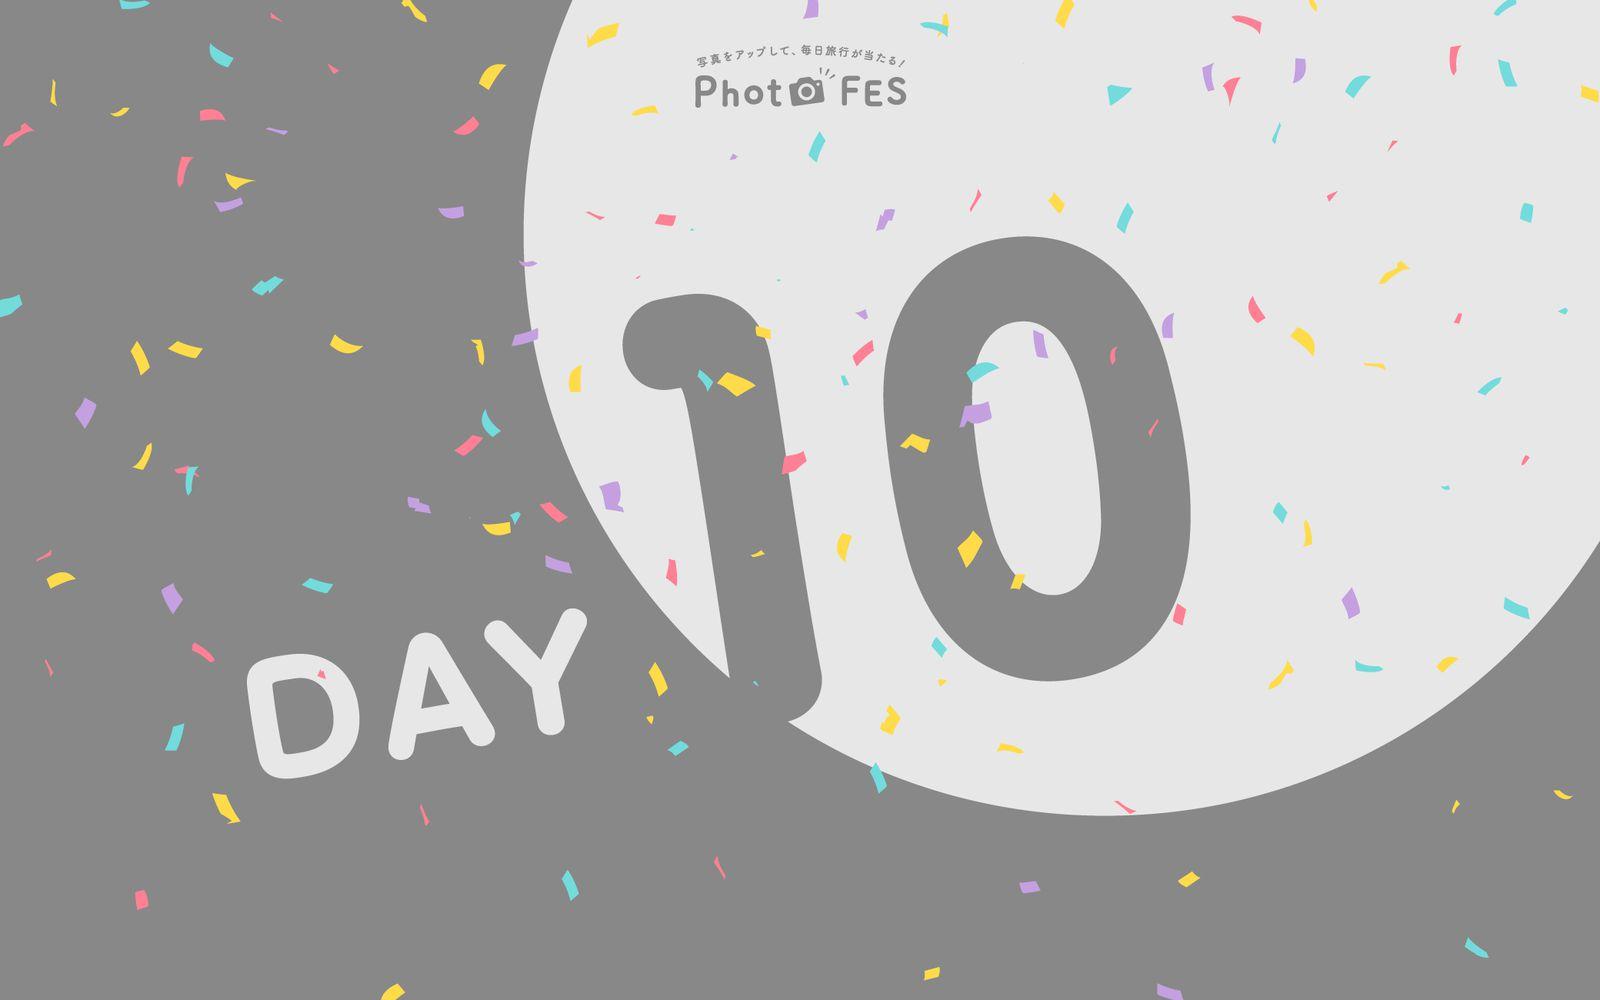 【DAY10】「Photo FES Summer シーズン2」8月26日投稿分であたる賞品&受賞者発表